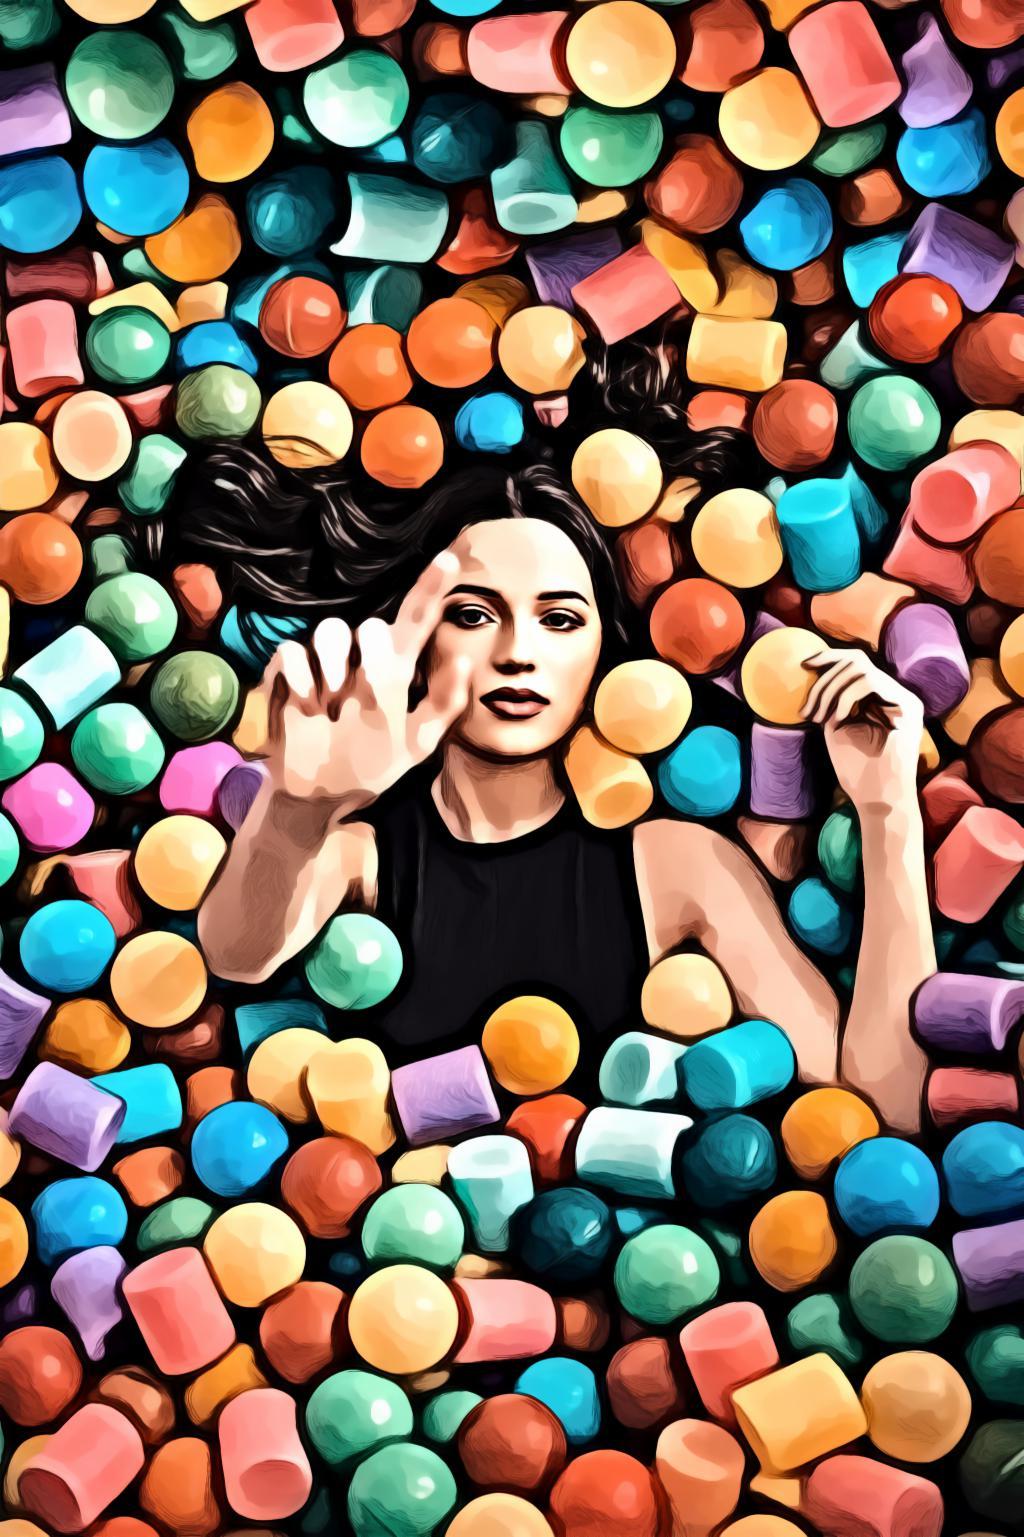 Woman on plastic balls